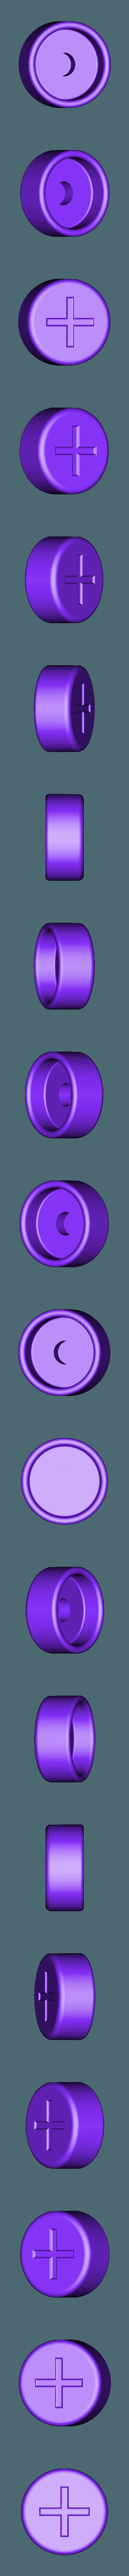 Cap%2B.stl Download free STL file 18mm Li-ion Battery Magnetic Connector • 3D printer model, VICLER